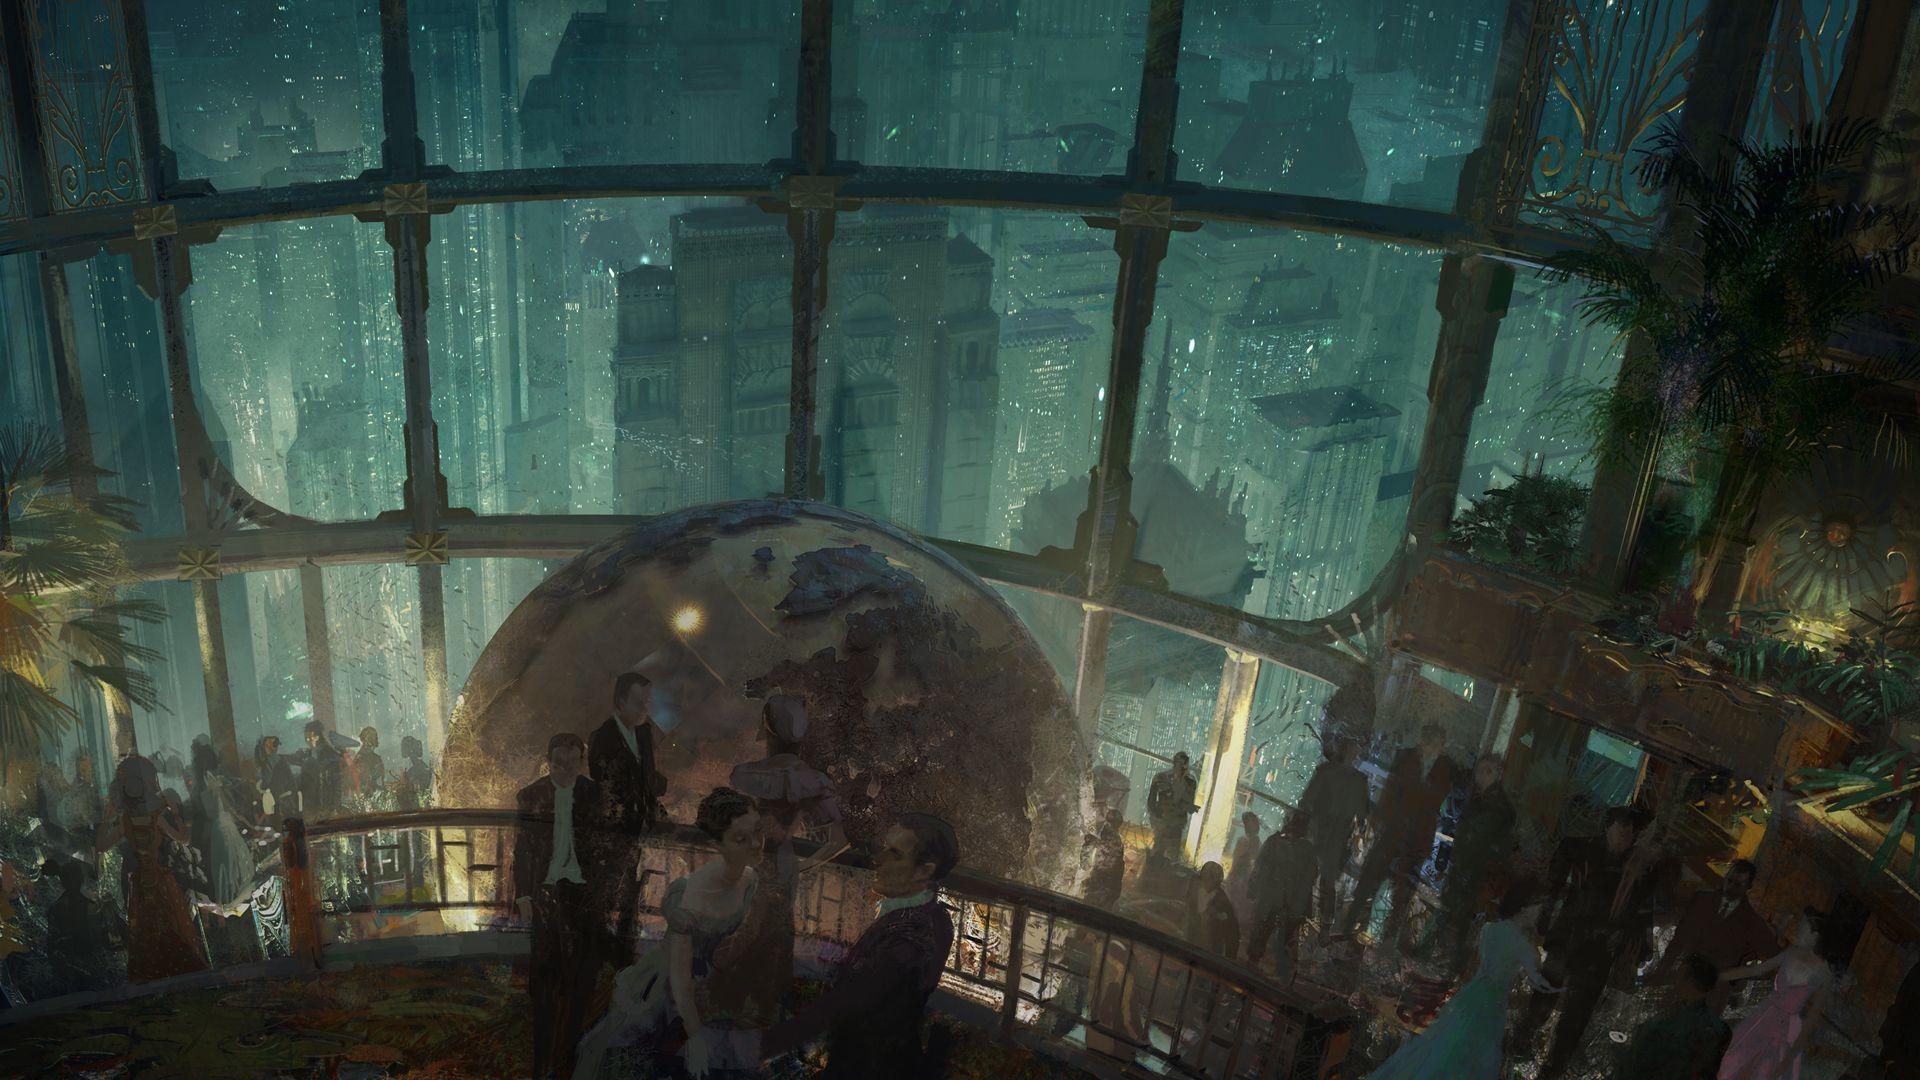 Rapture Bioshock Wallpaper